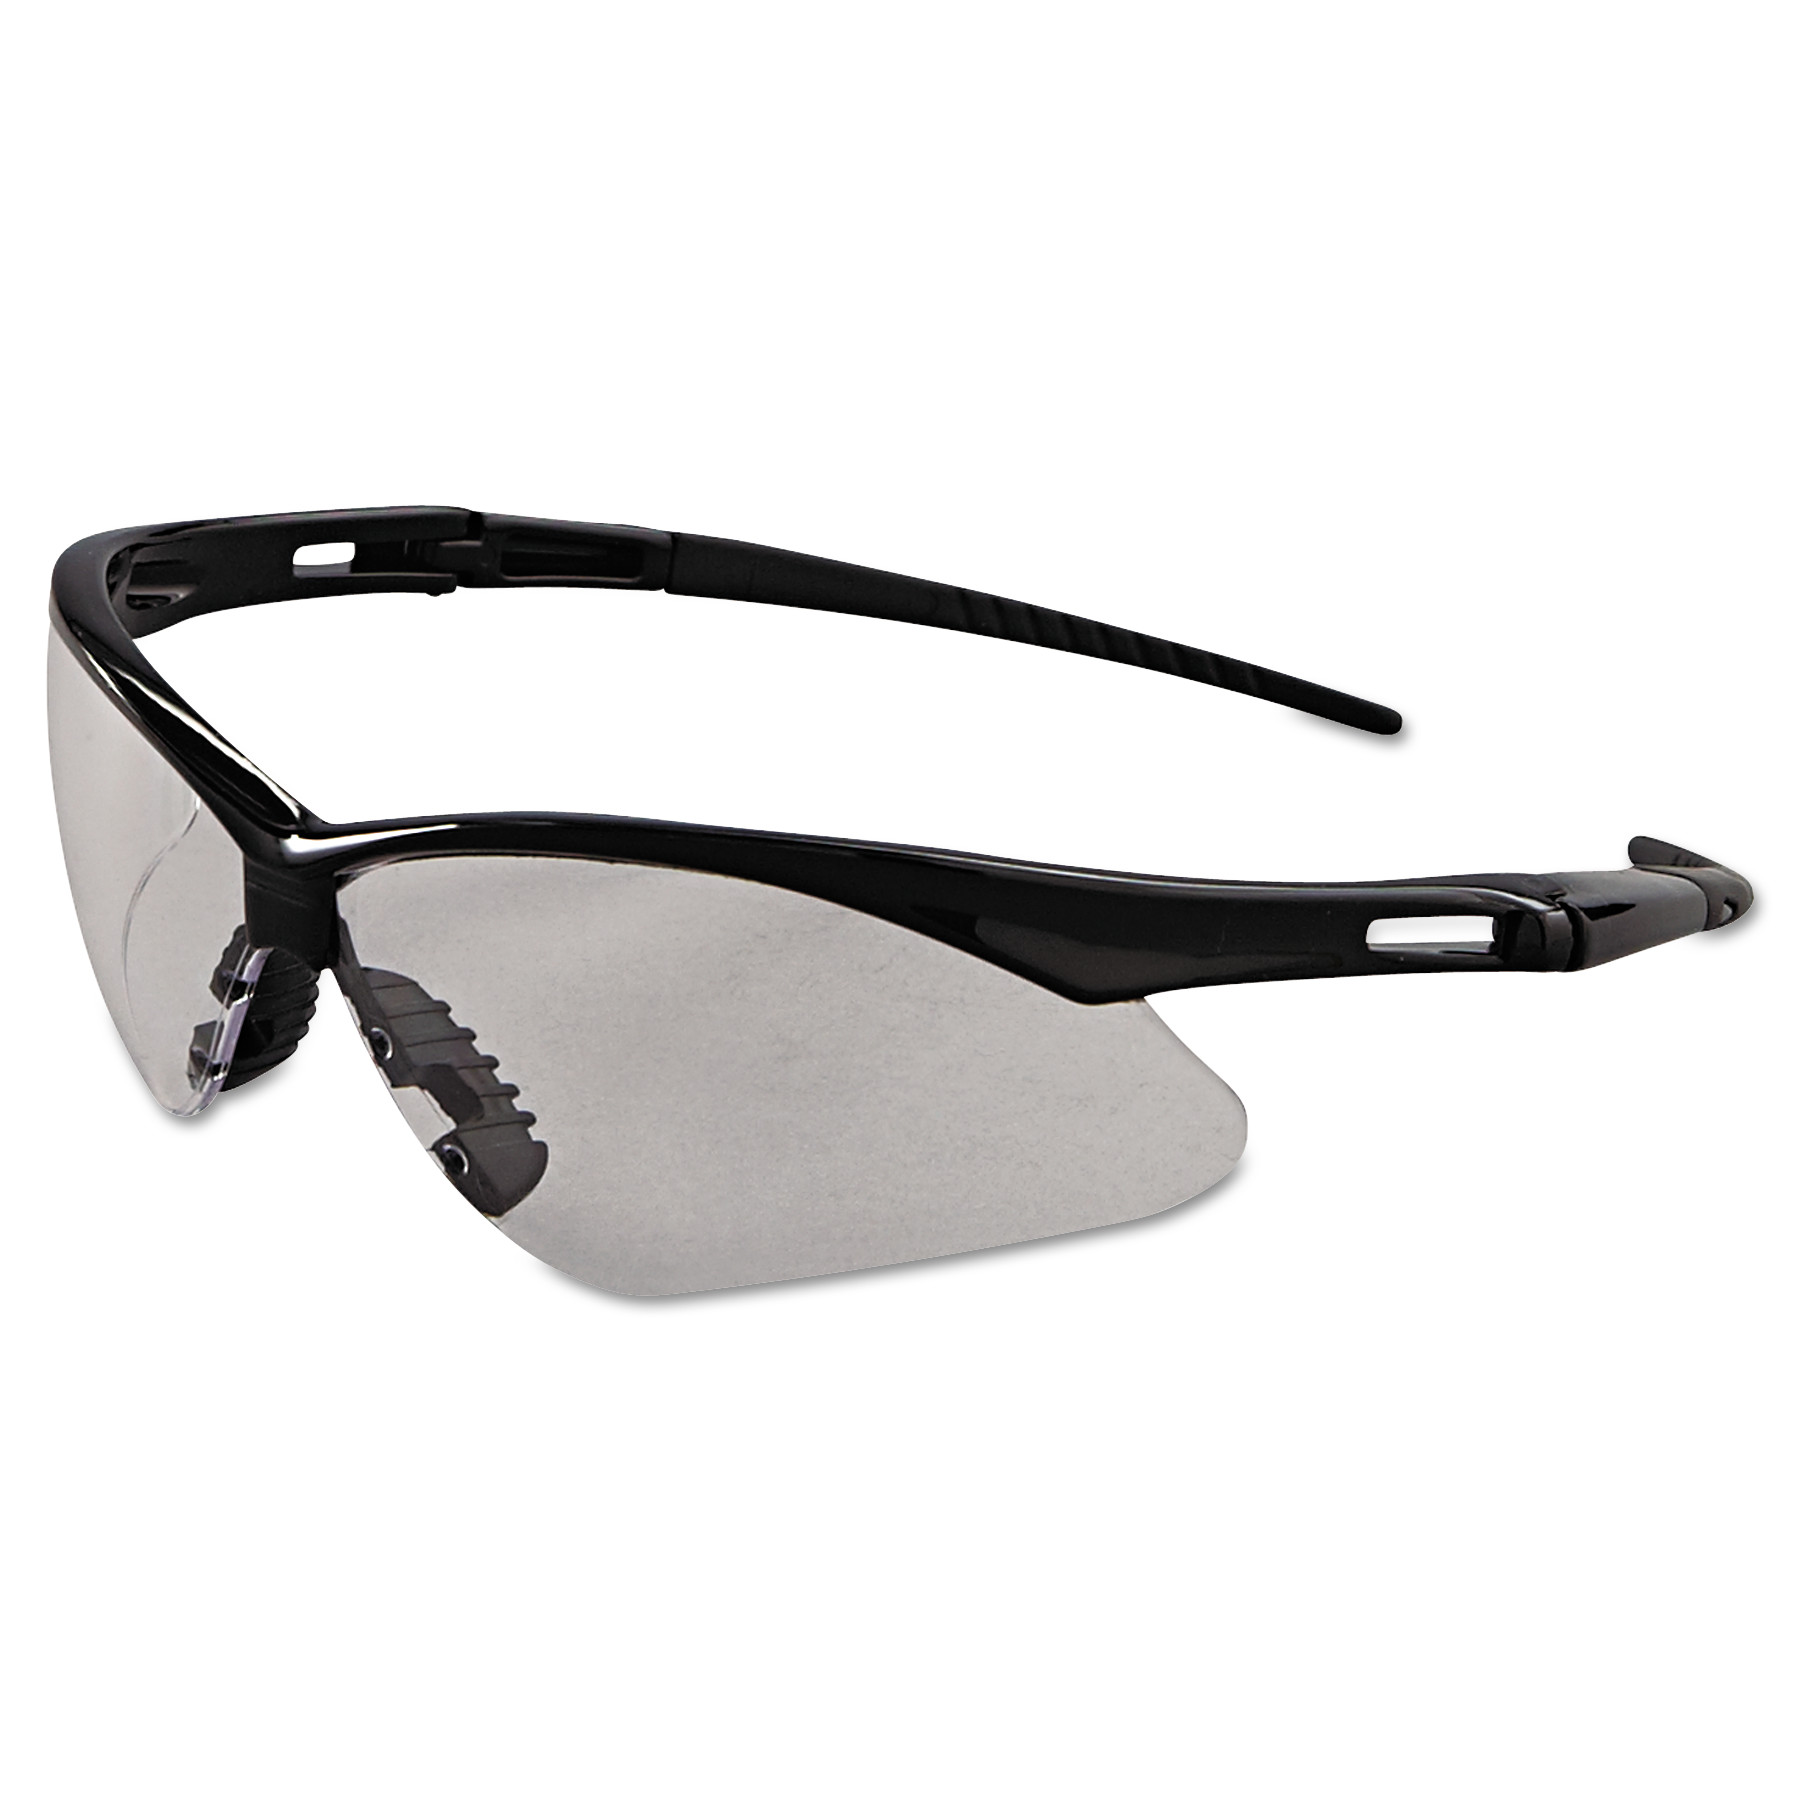 Jackson Safety* Nemesis Safety Glasses, Black Frame, Clear Anti-Fog Lens by Kimberly Clark